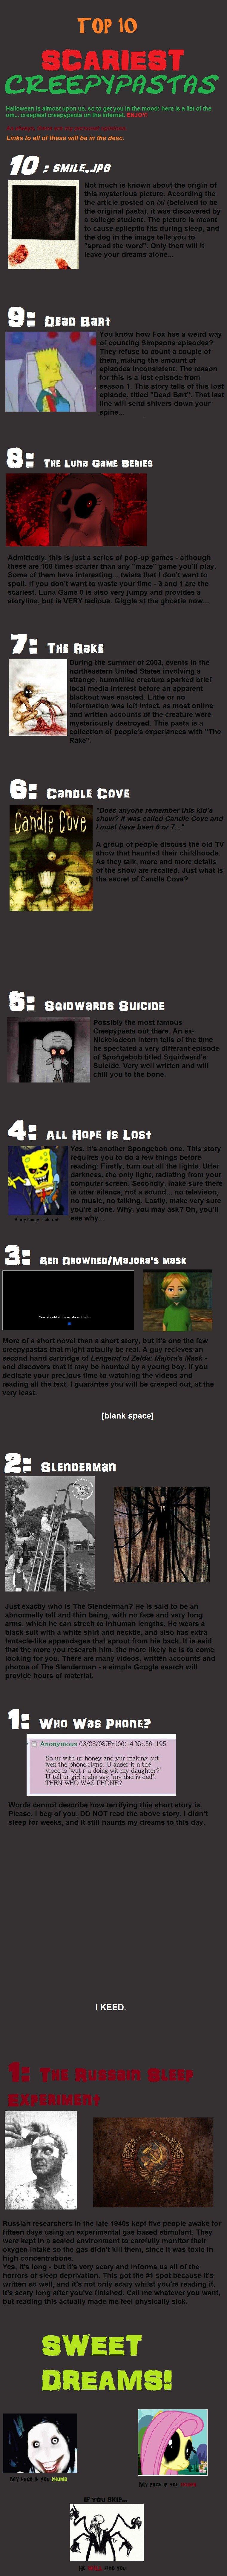 Top 10 Scariest Creepypastas. Smile.jpg: knowyourmeme.com/memes/smilejpg#.Tqua... Dead Bart: creepypasta.wikia.com/wiki/Dead_Bart The Luna Game Series: knowyour Scary shit